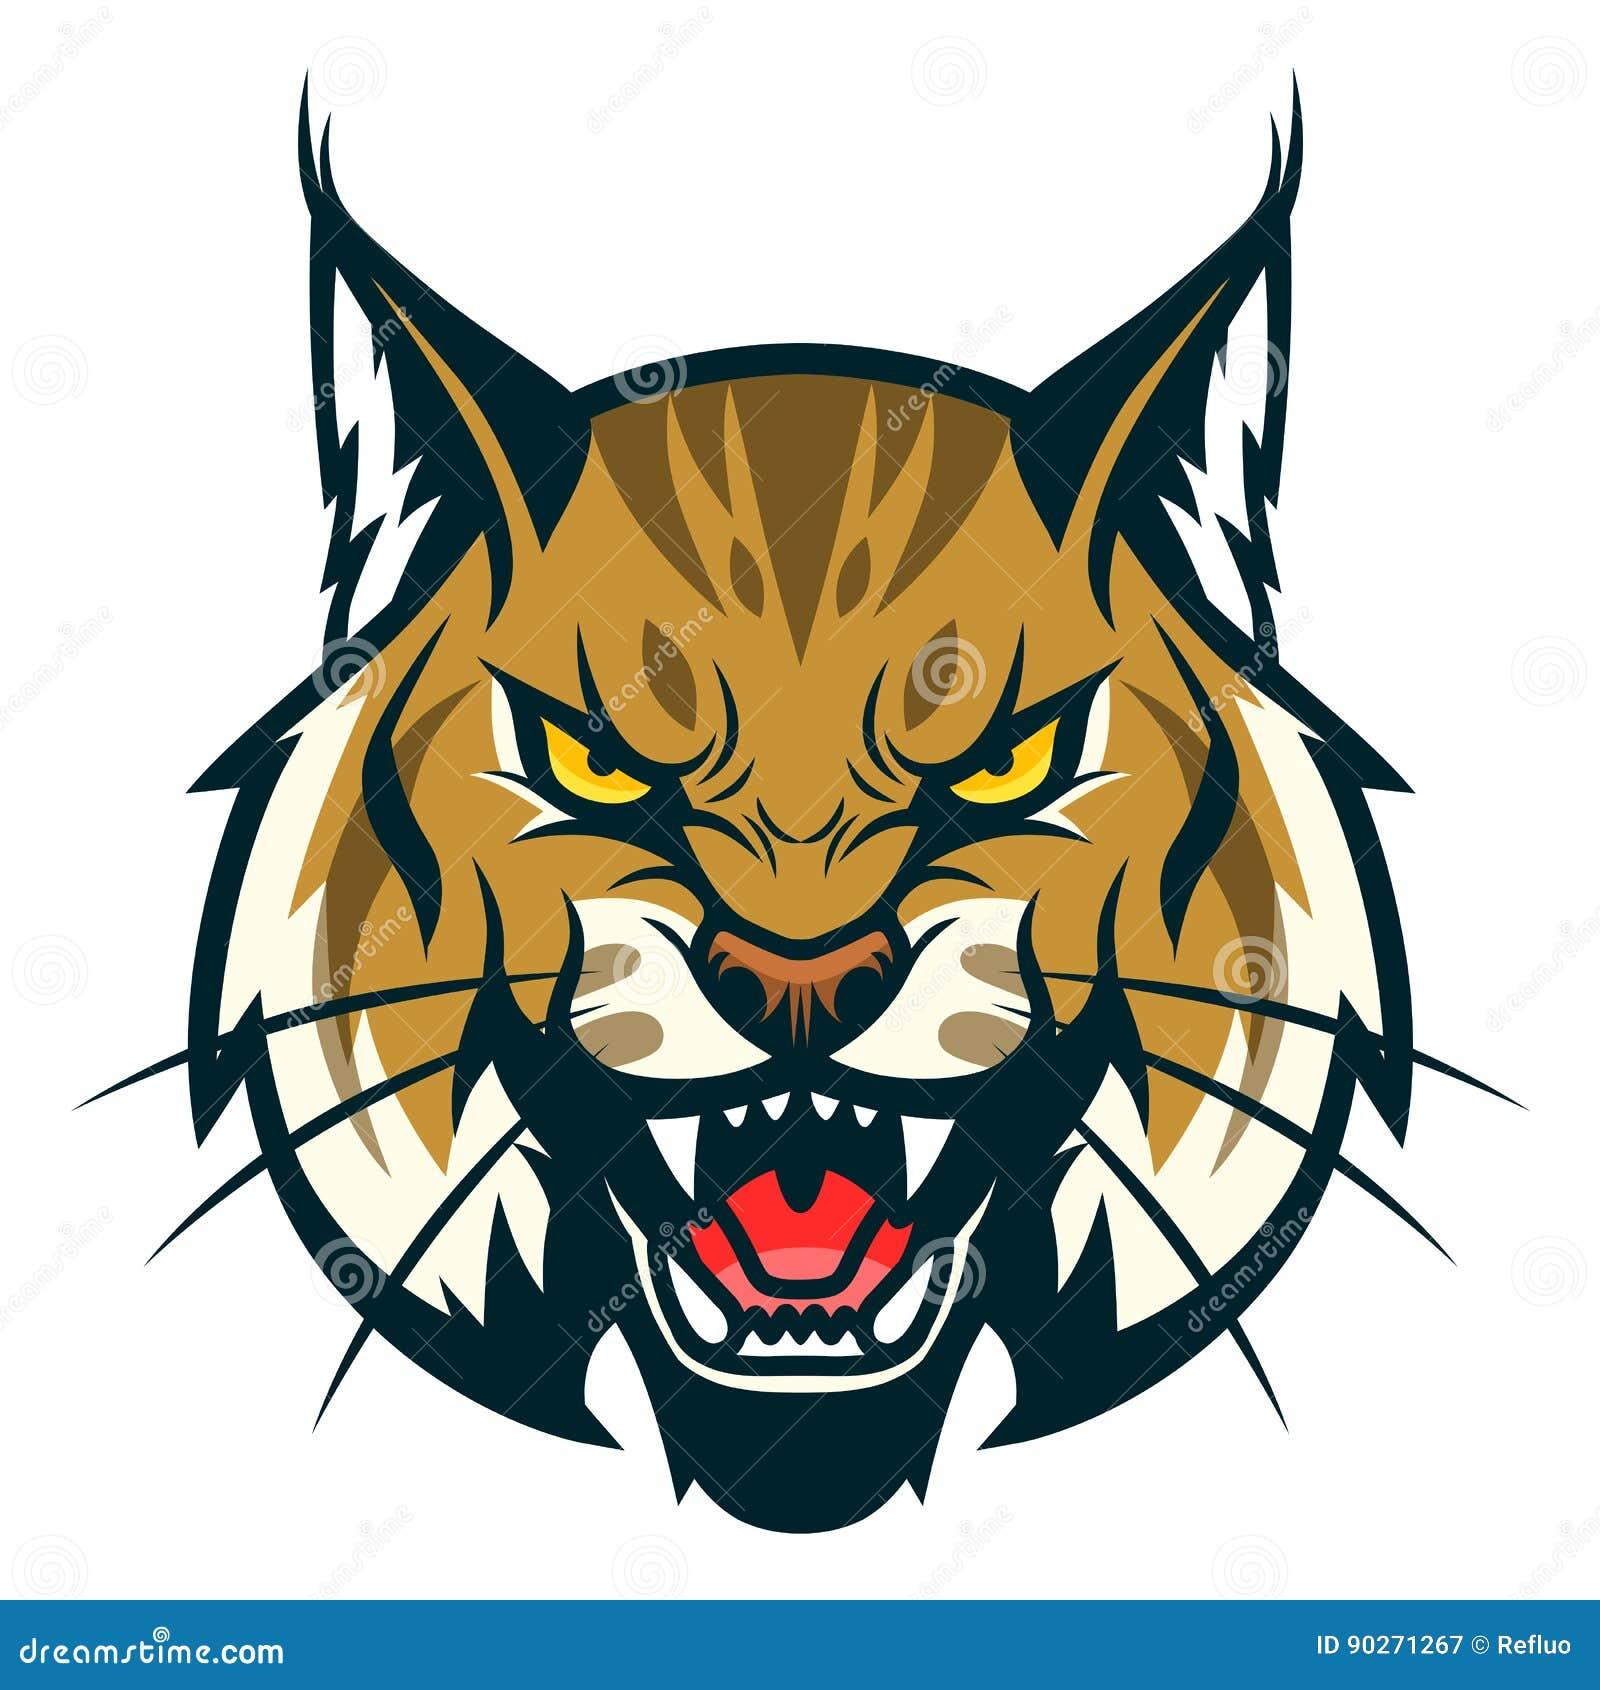 c2d8e2a73 Bobcat head stock vector. Illustration of face, tattoo - 90271267